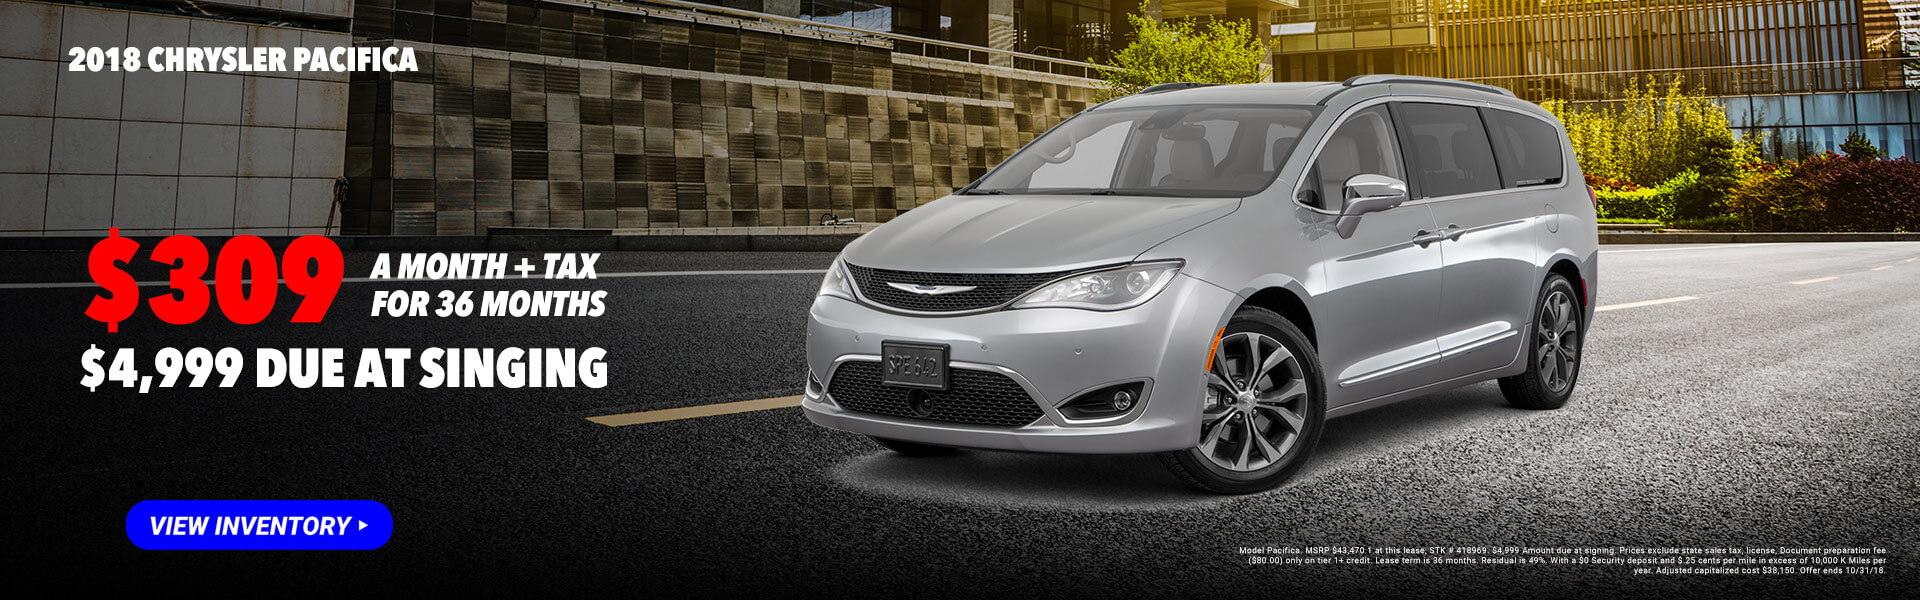 2018 Chrysler Pacifica #418969